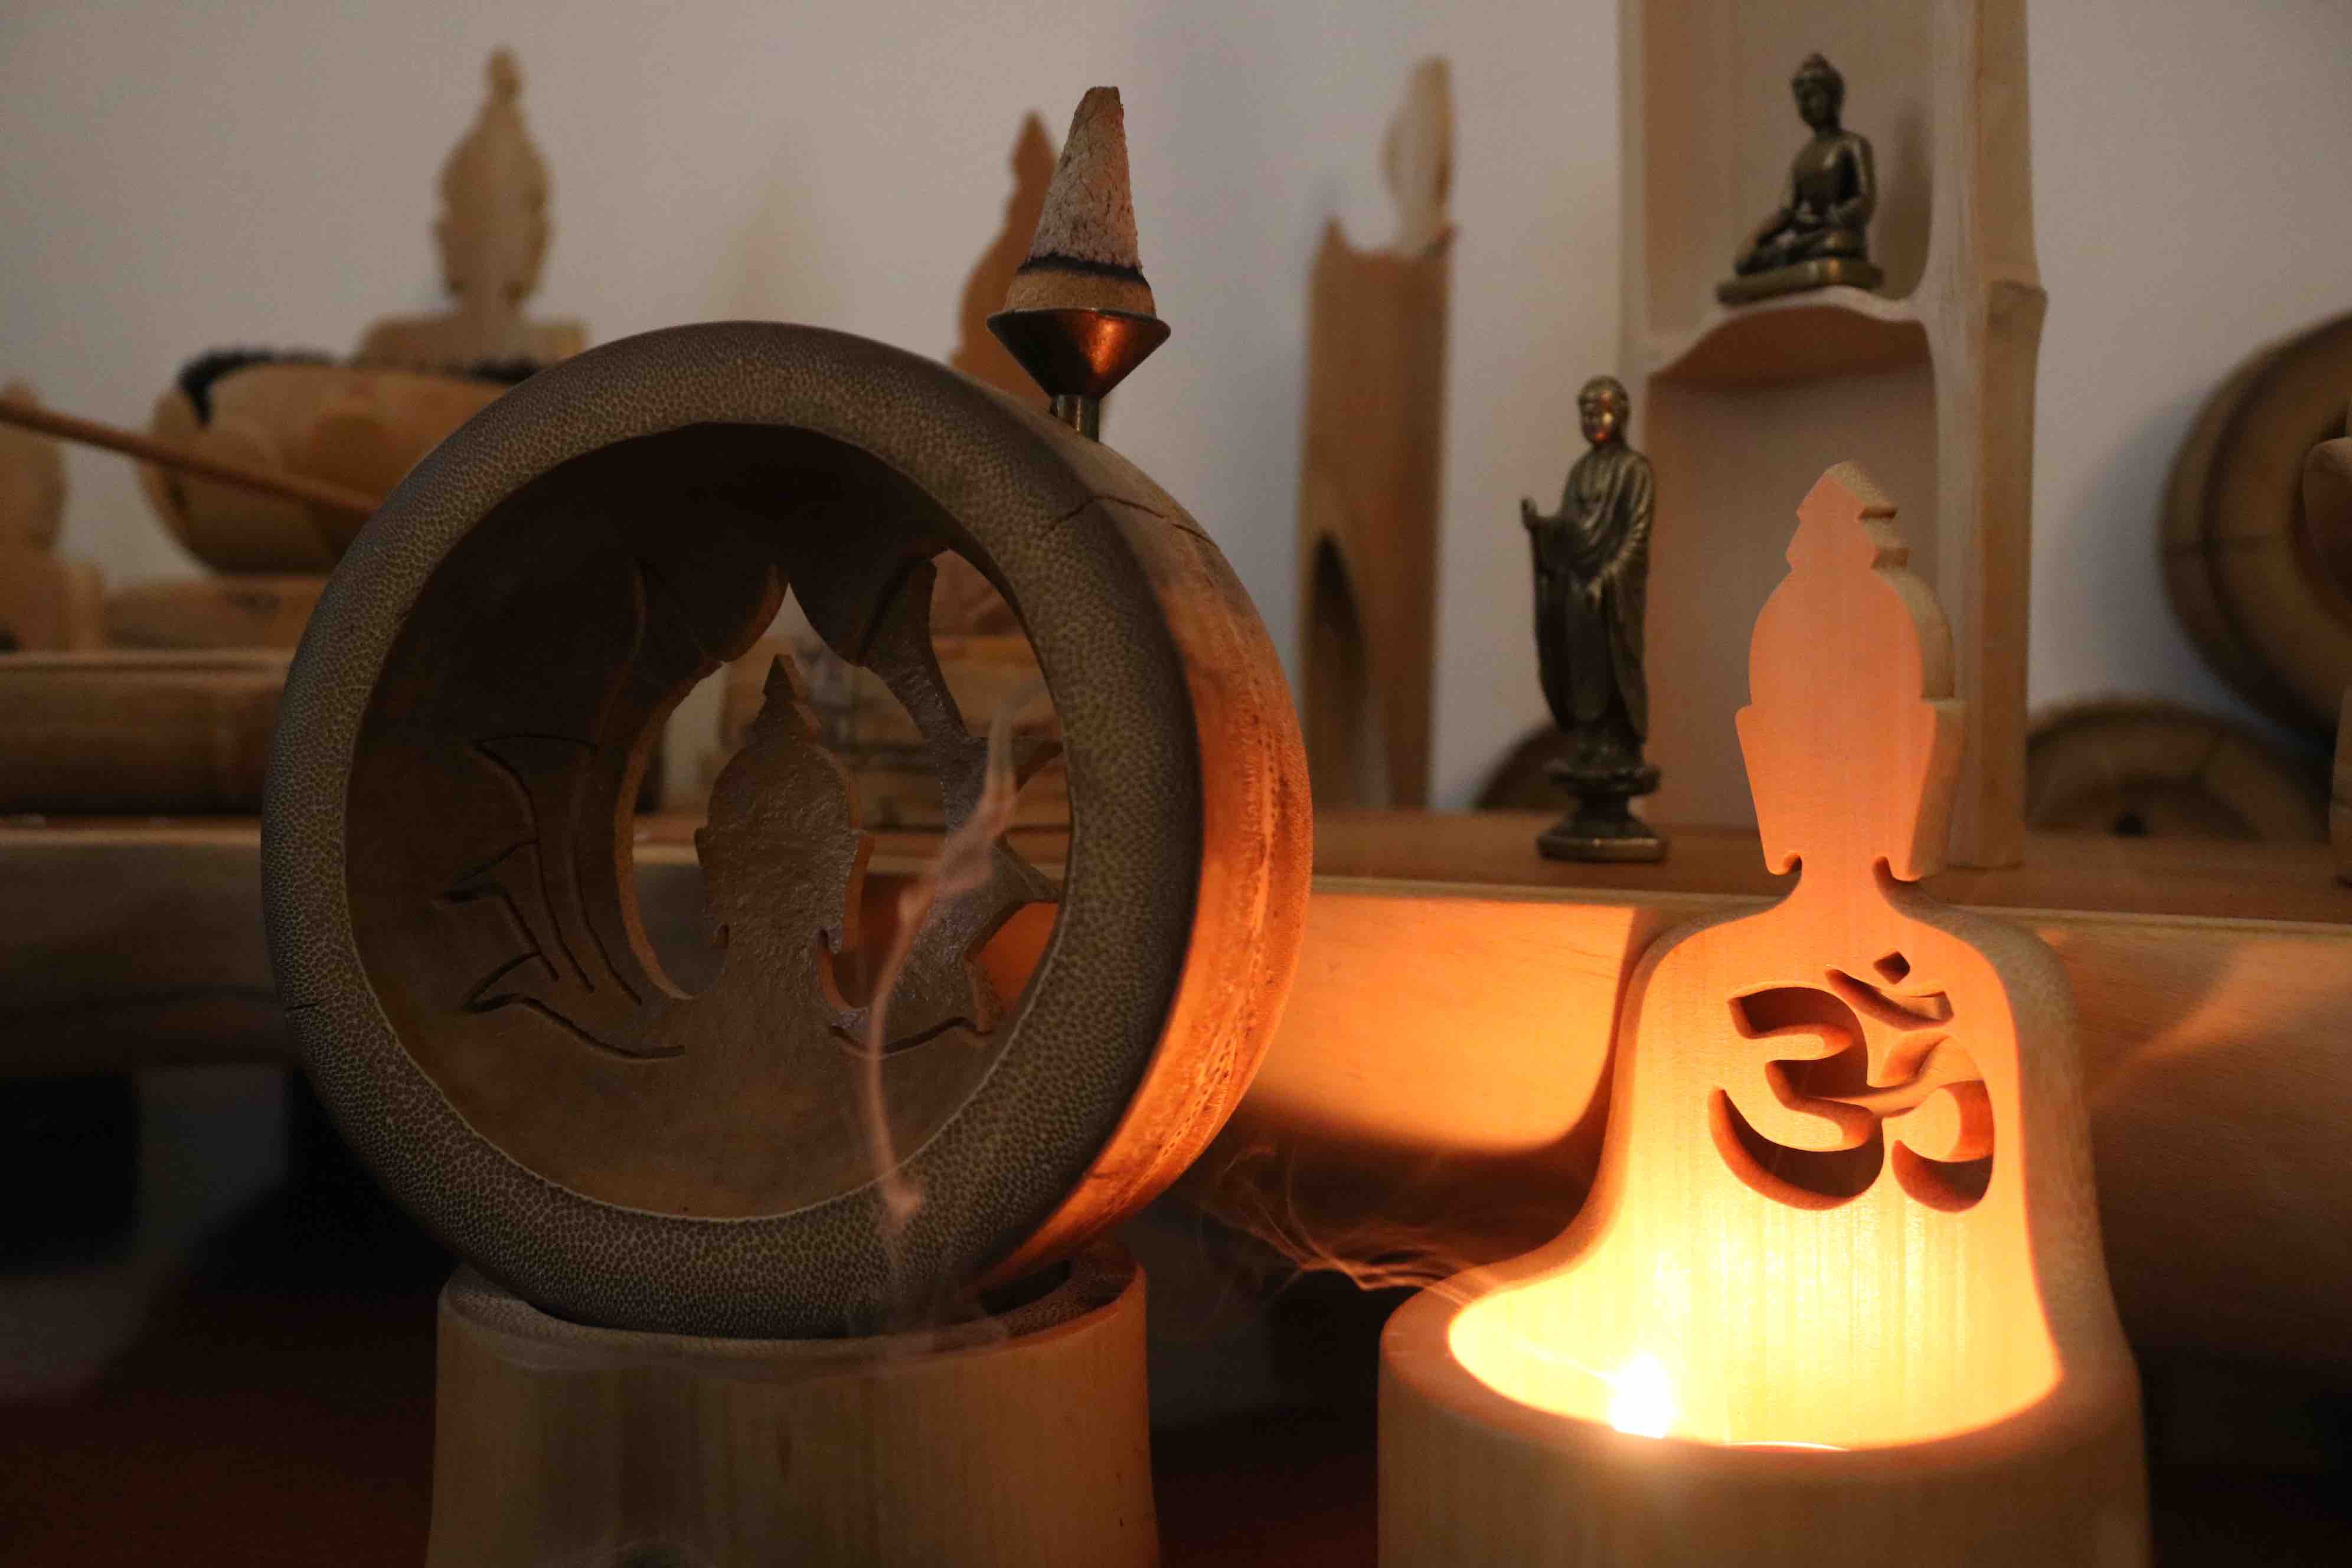 Vietnamese man carves spiritual icons on bamboo nodes